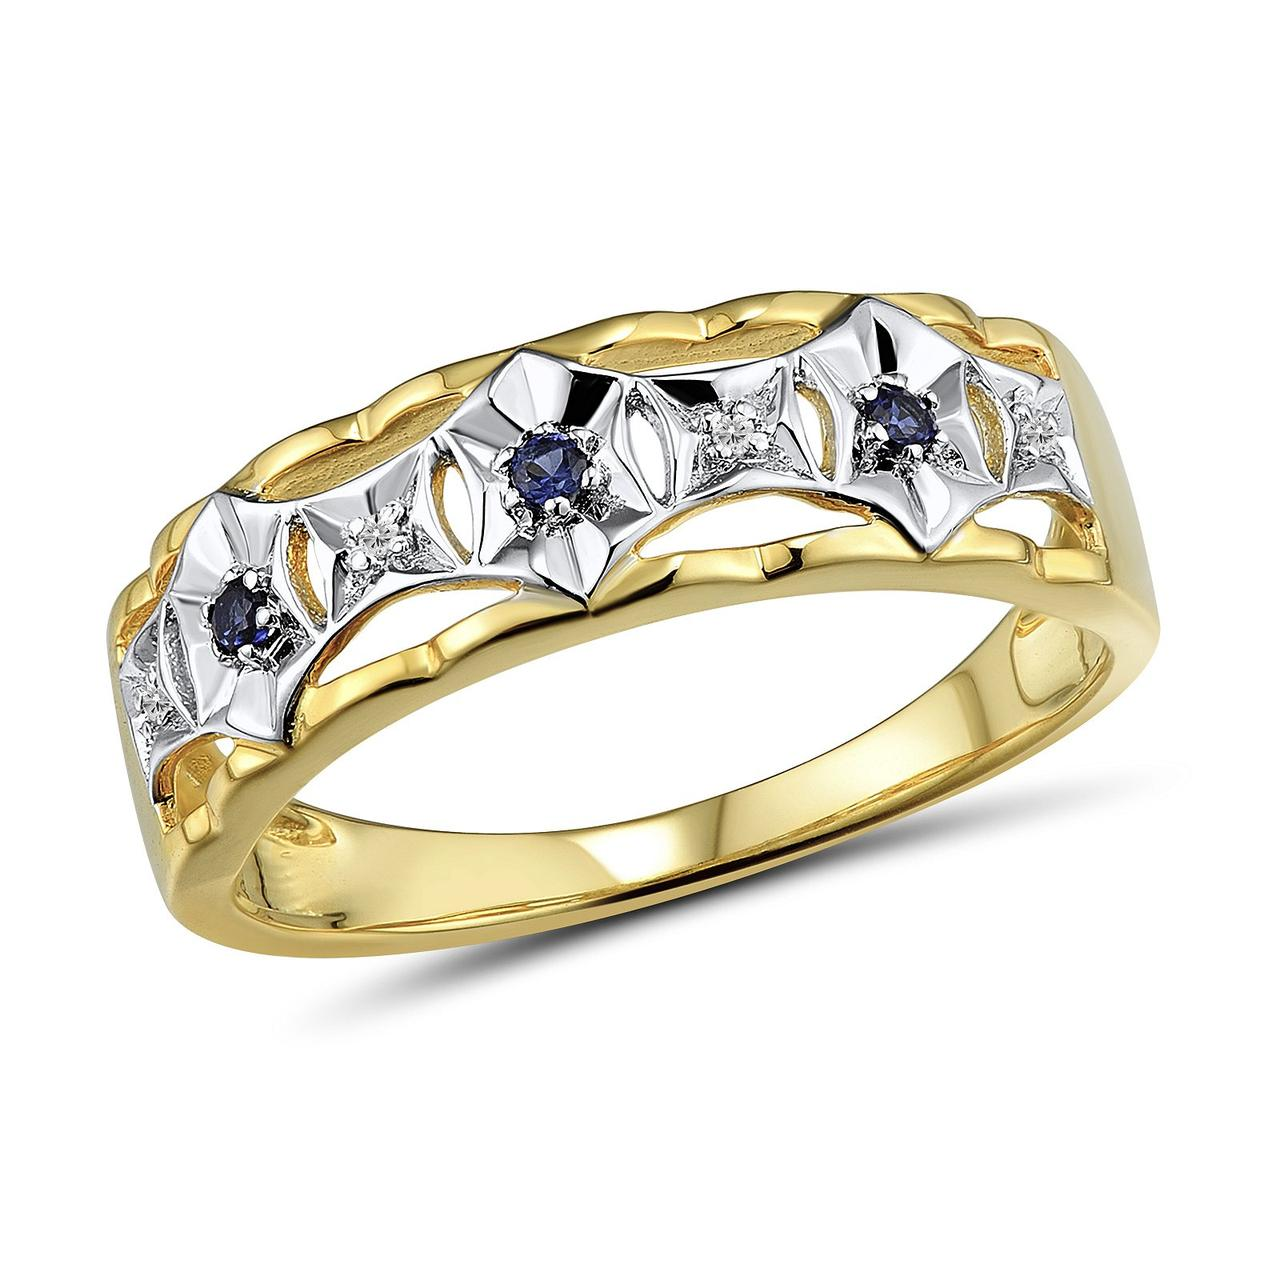 Золотое кольцо с бриллиантами и сапфирами, размер 16 (1645325)